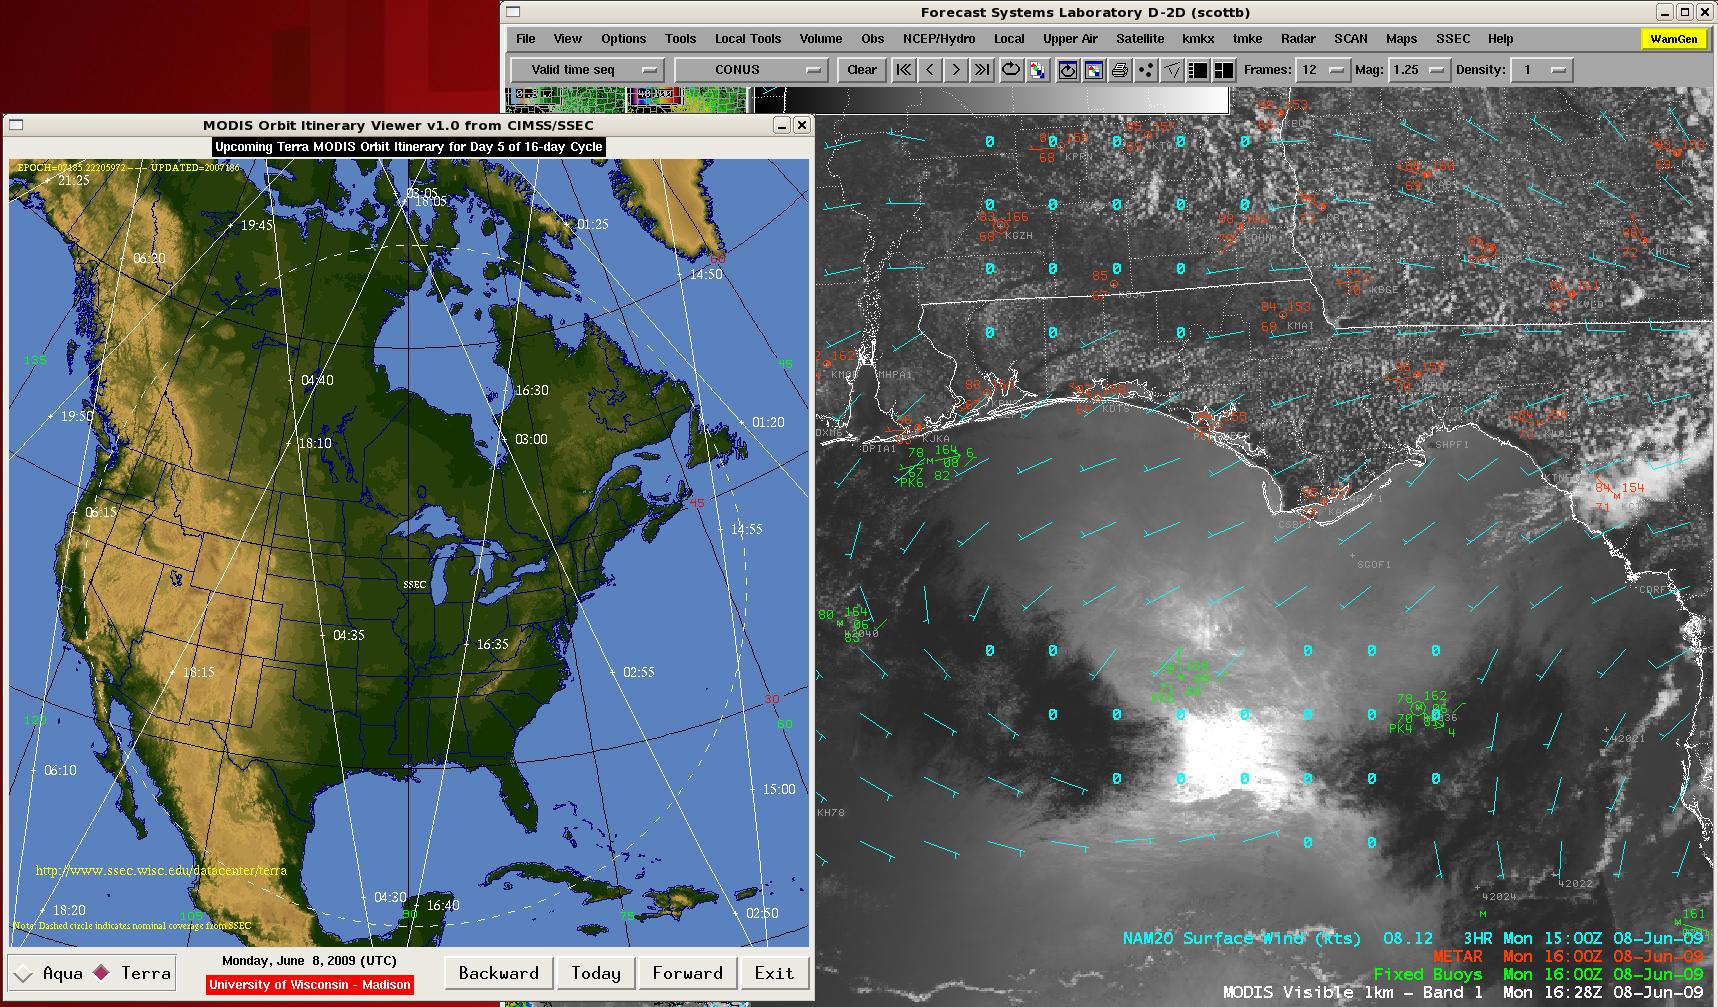 MODIS visible image + Terra satelite overpass geometry